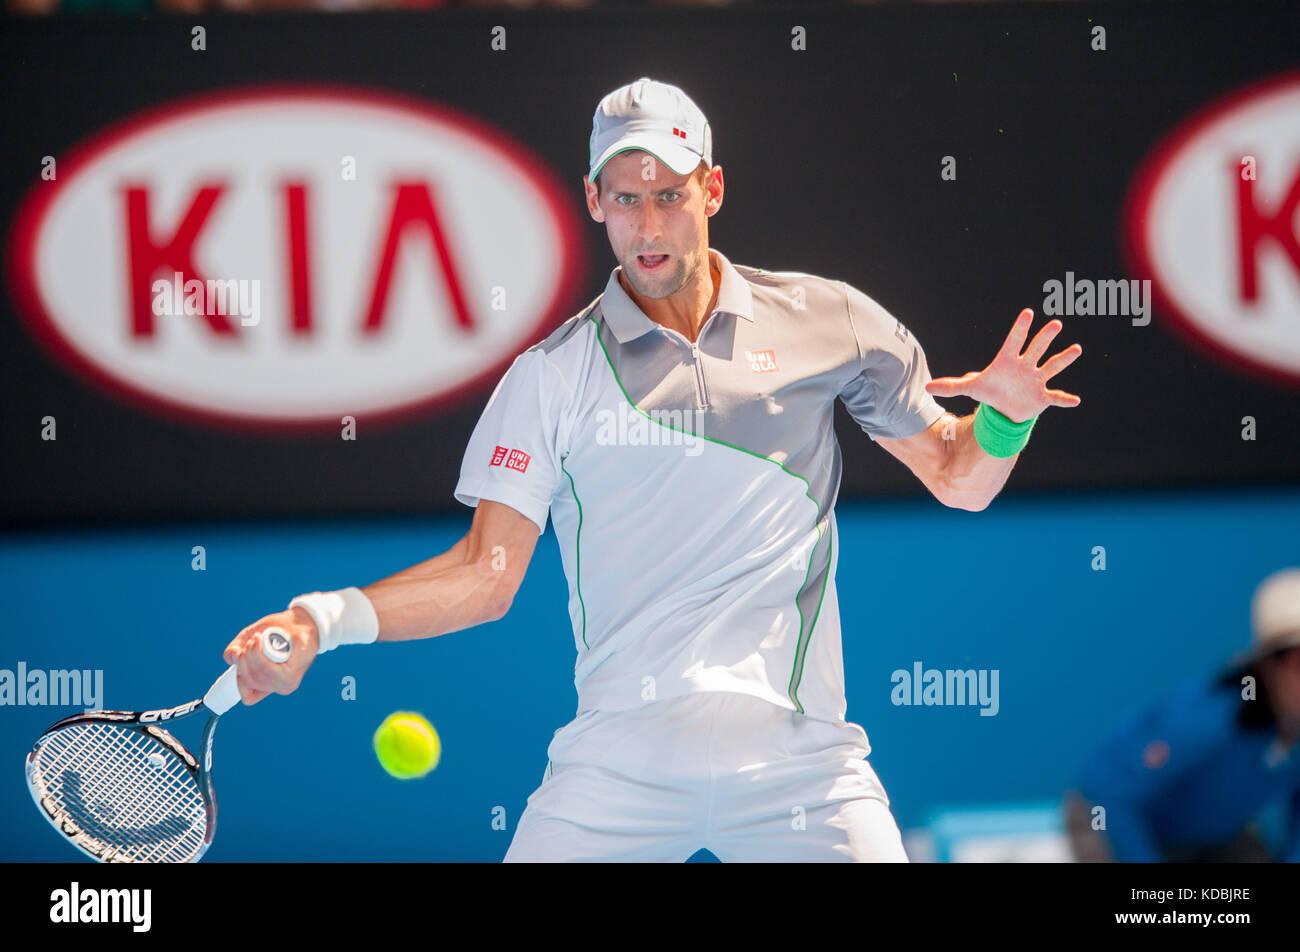 Defending Australian Open Champion Novak Djokovic (SRB) took on L. Mayer (ARG) in third day, second round play. - Stock Image